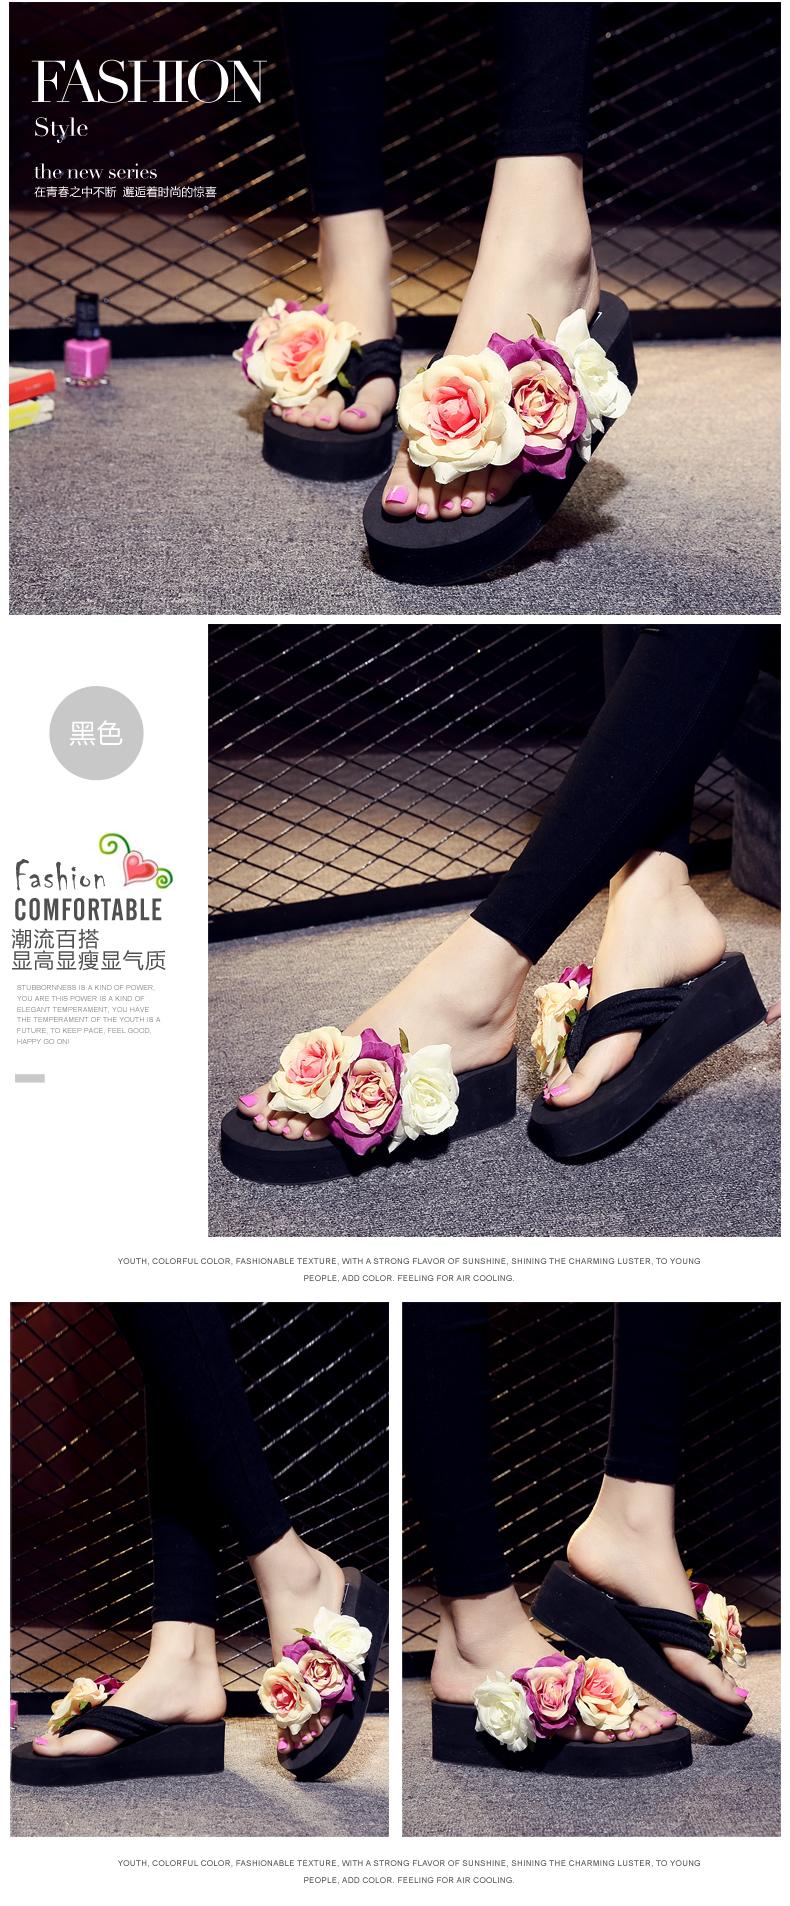 Plastic Fashionflip flop(Flower white -36) NHXW0183-Flower white -36